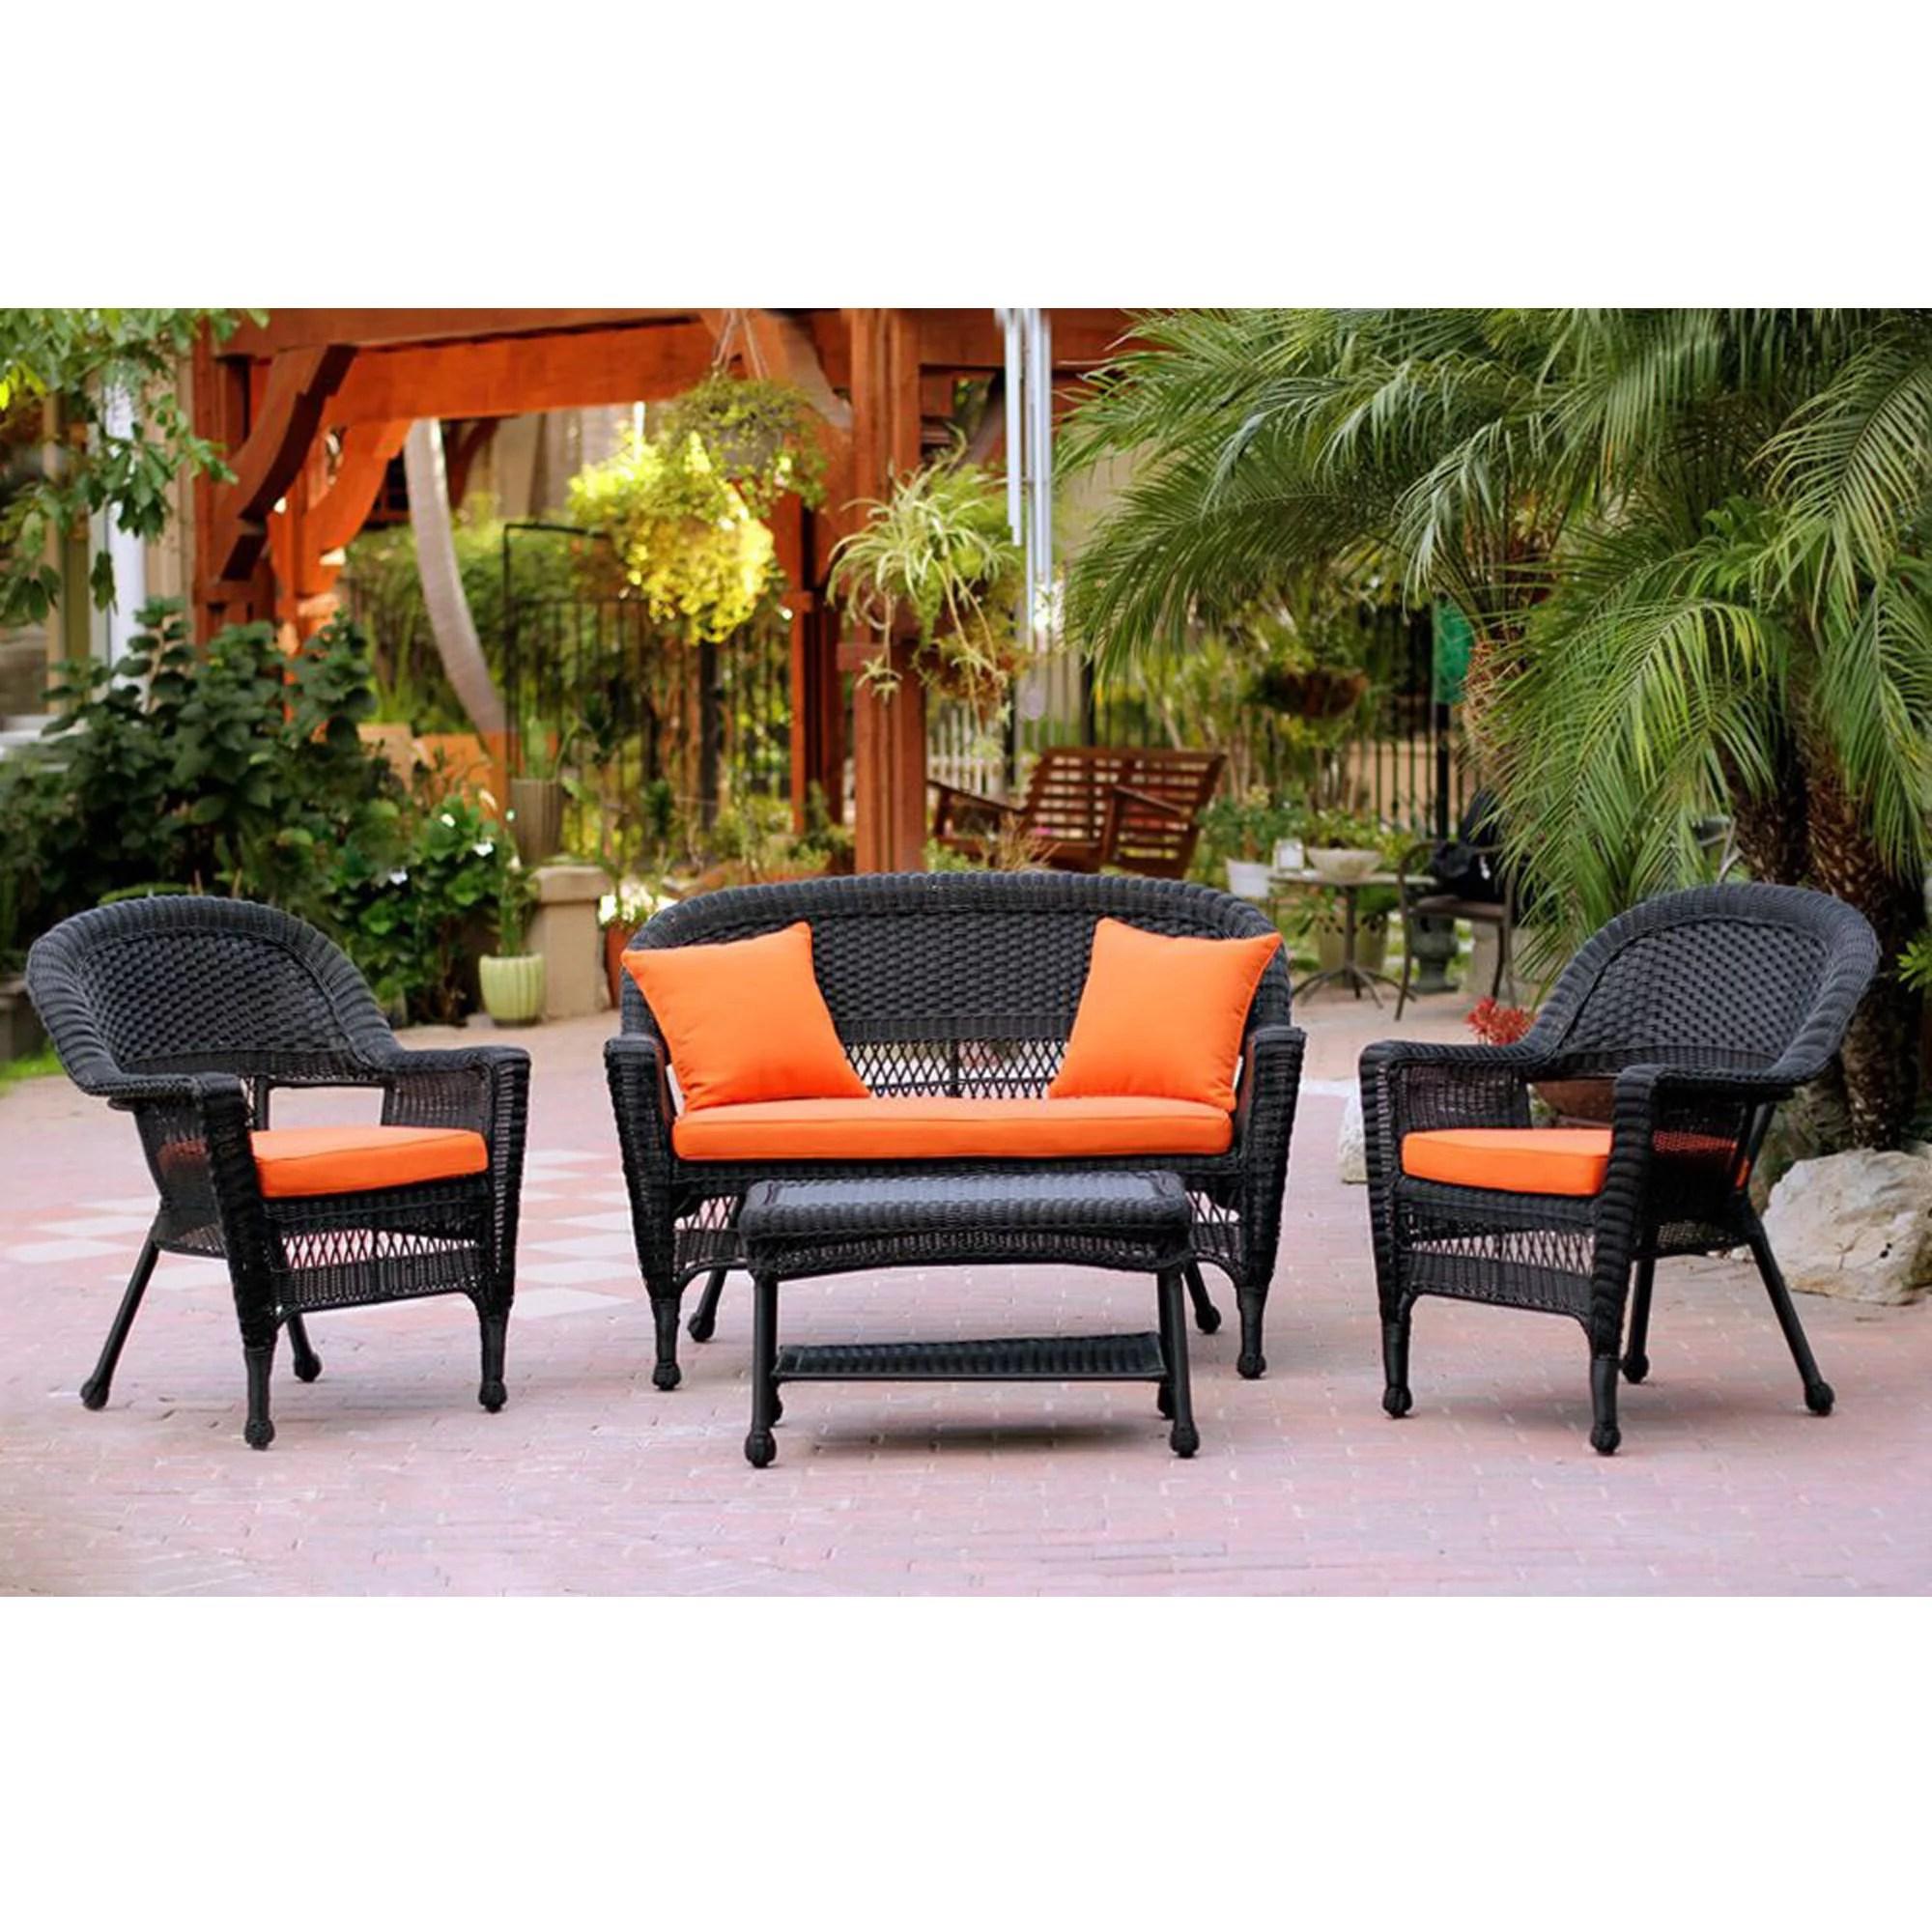 4 piece black wicker patio chair loveseat table furniture set orange cushions 51 walmart com